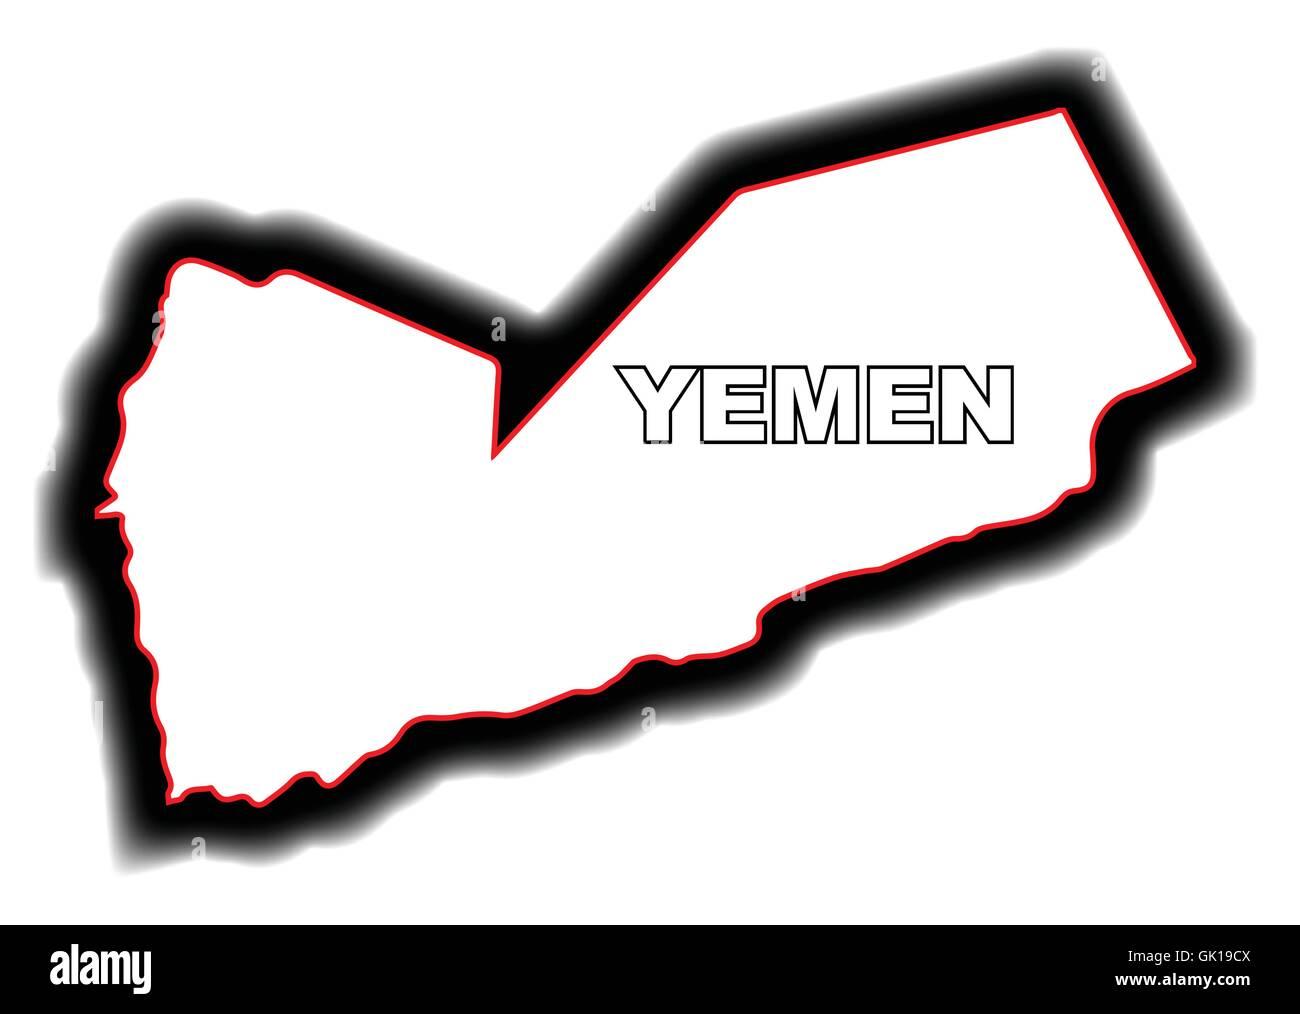 Outline Map of Yemen - Stock Image